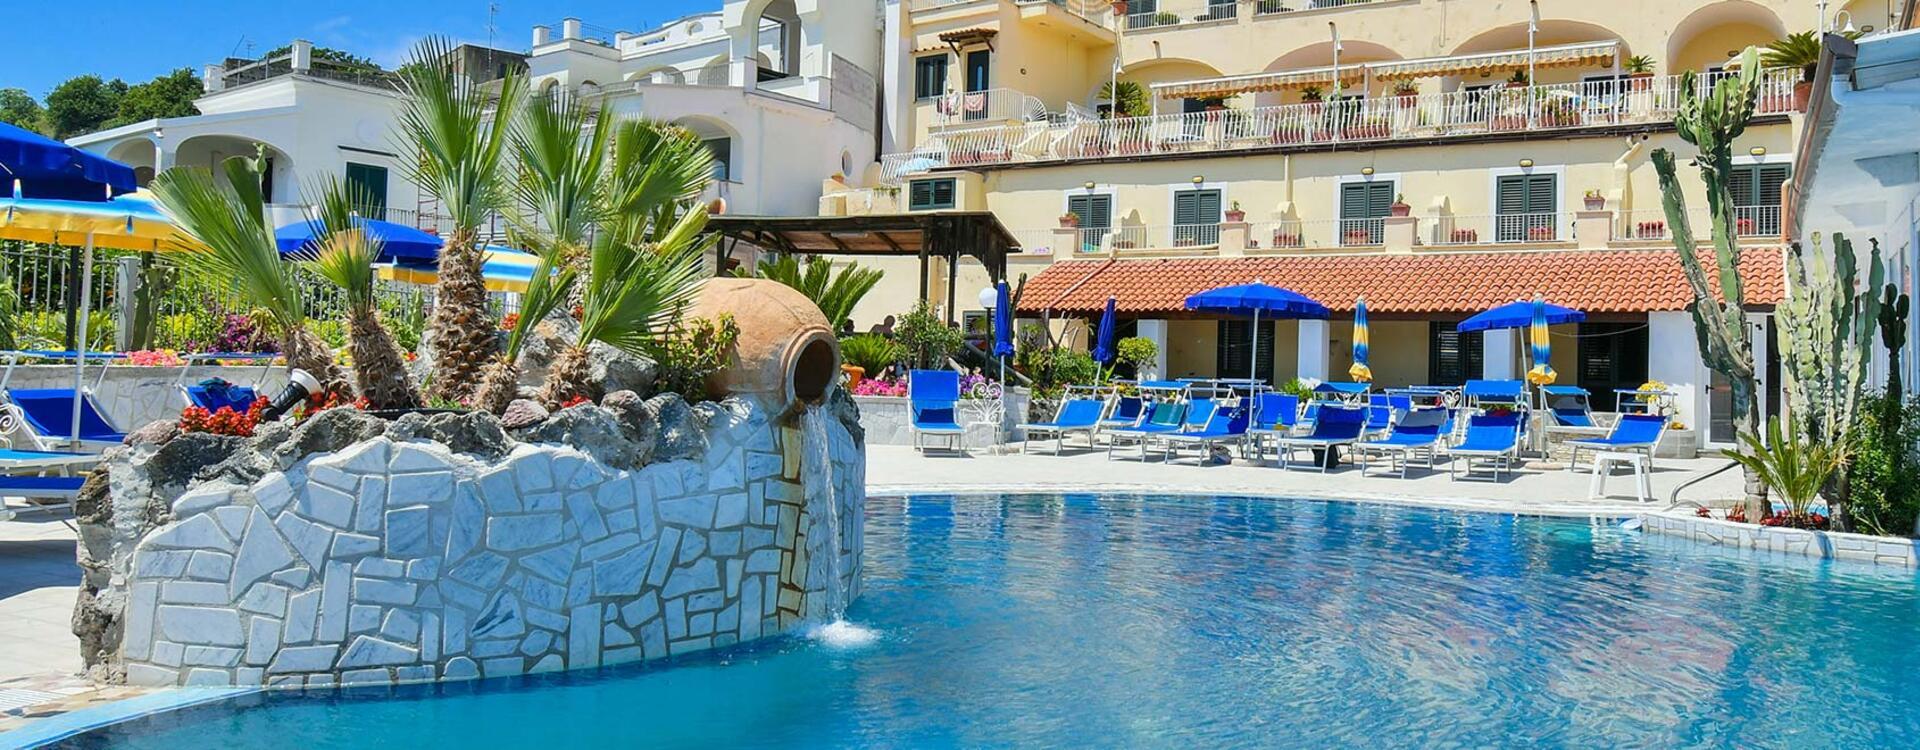 hotelsaintraphaelischia en swimming-pools 009